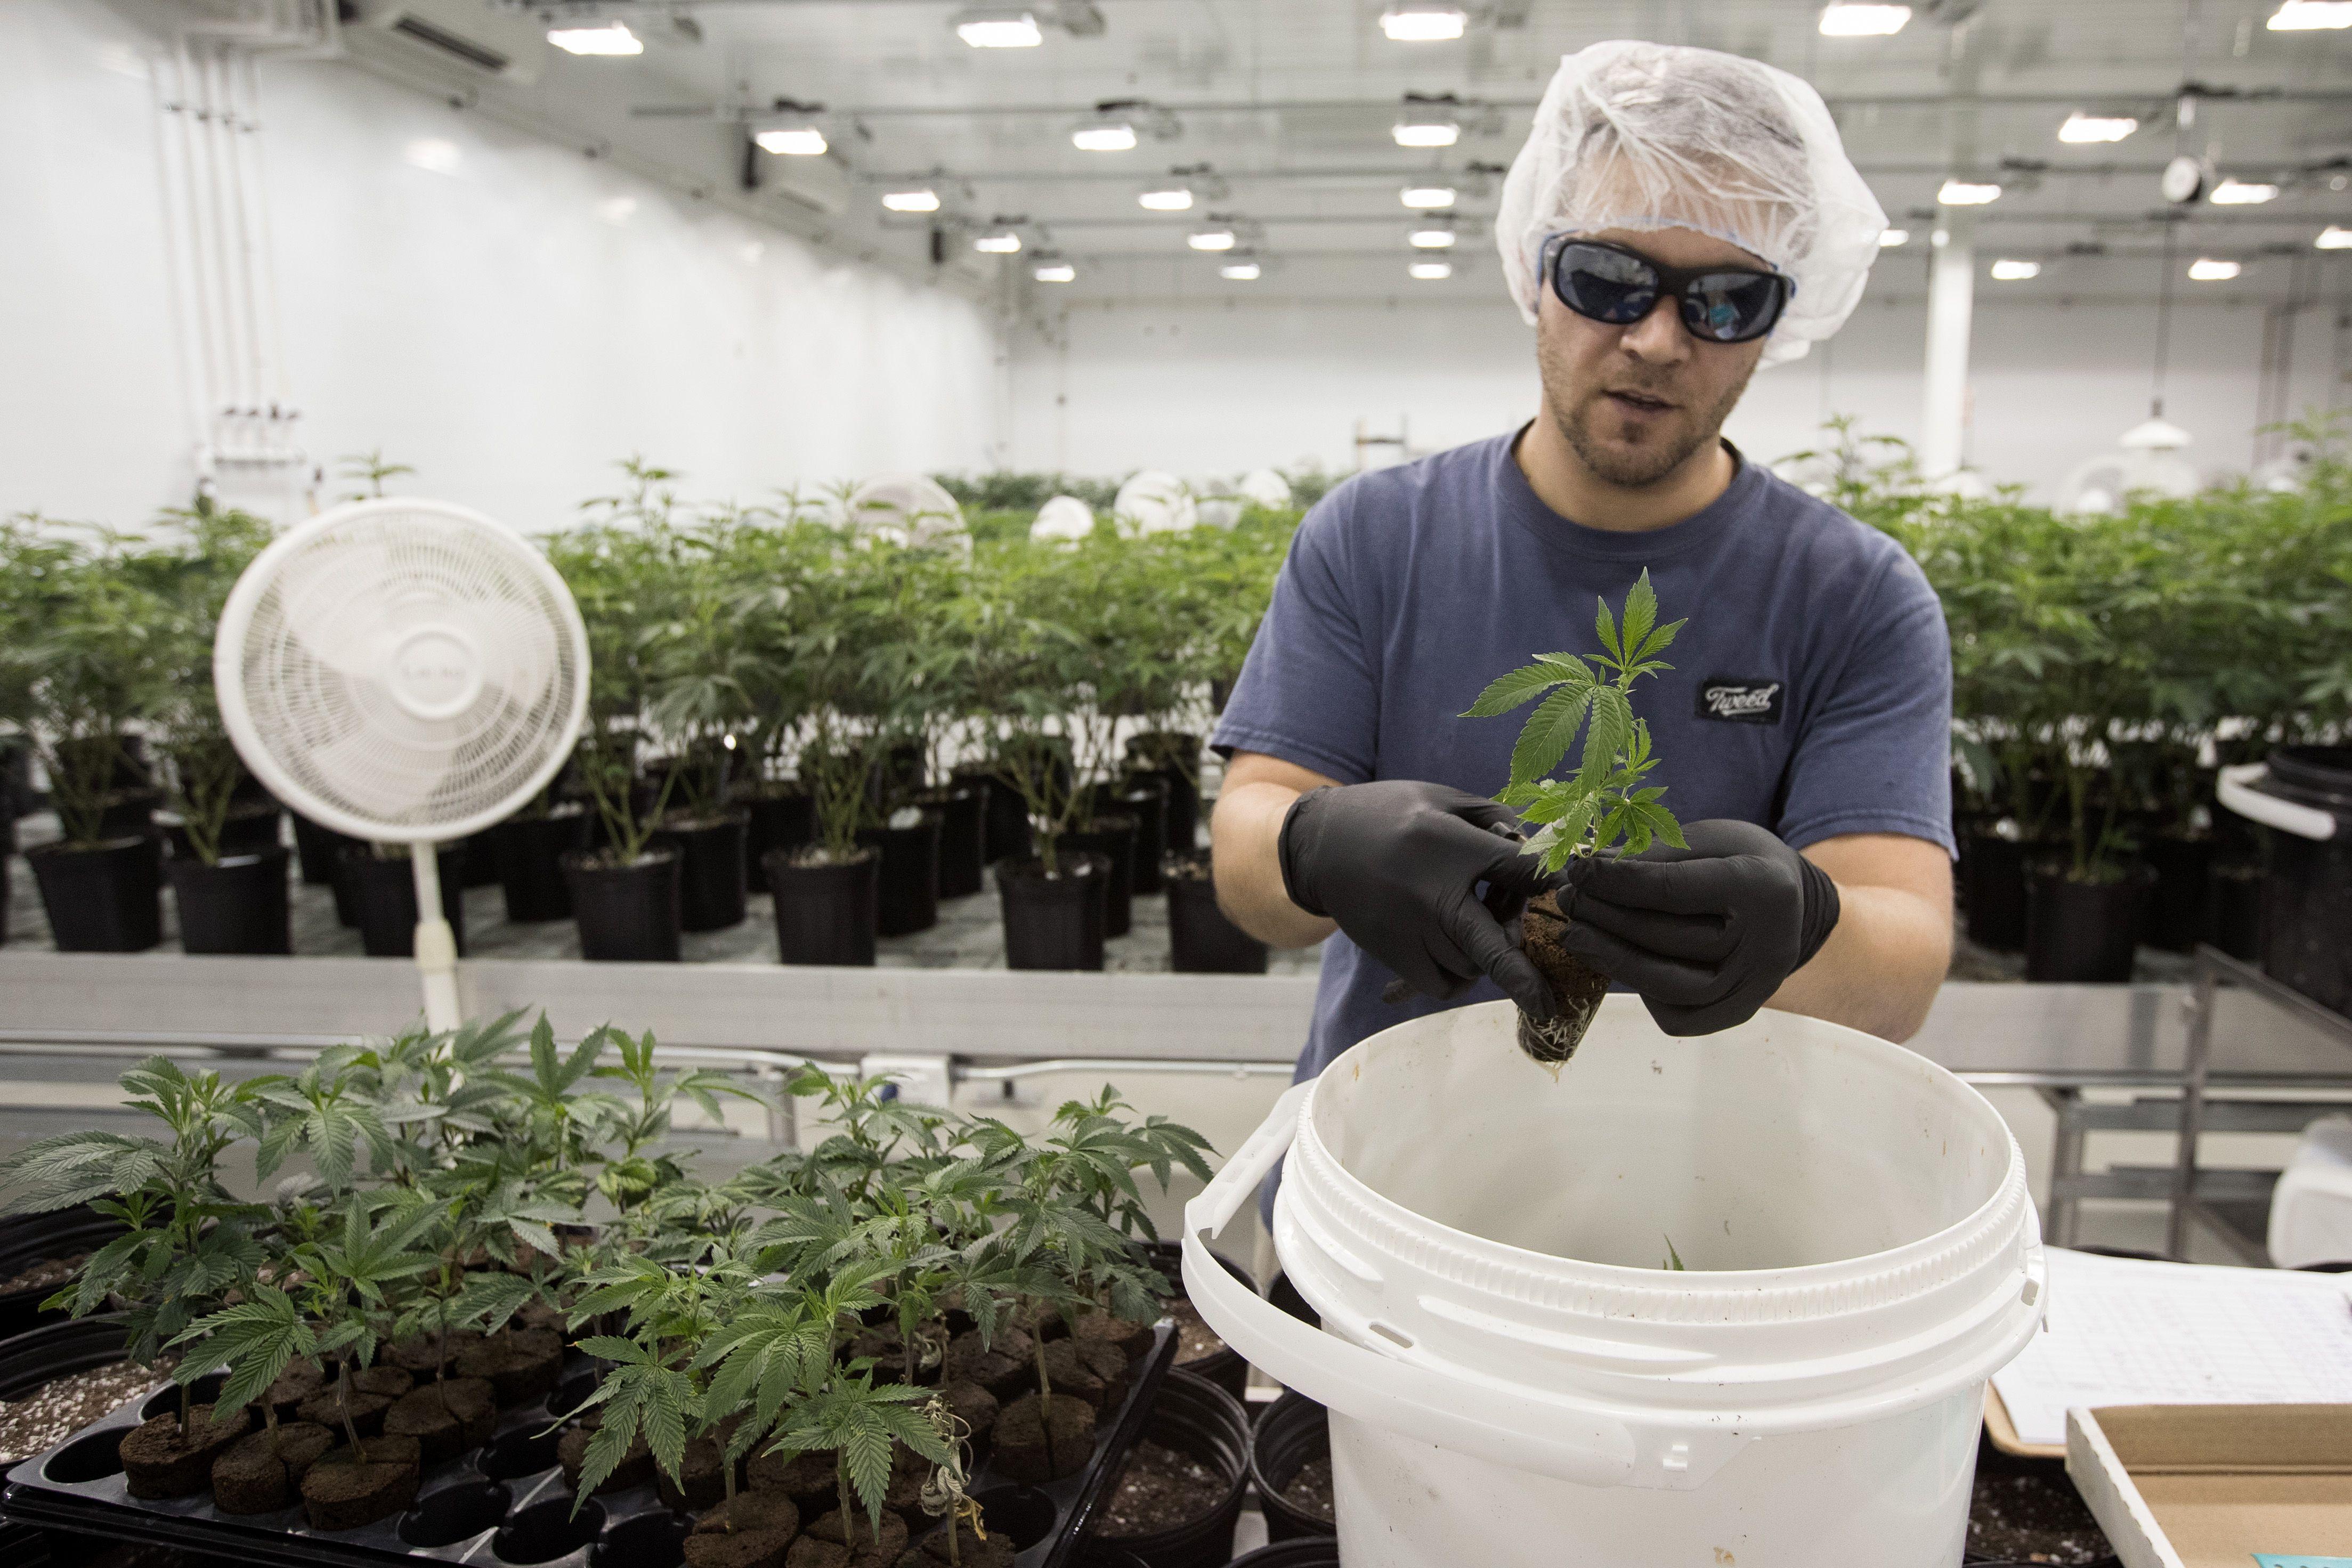 A man trims marijuana plants in a production facility